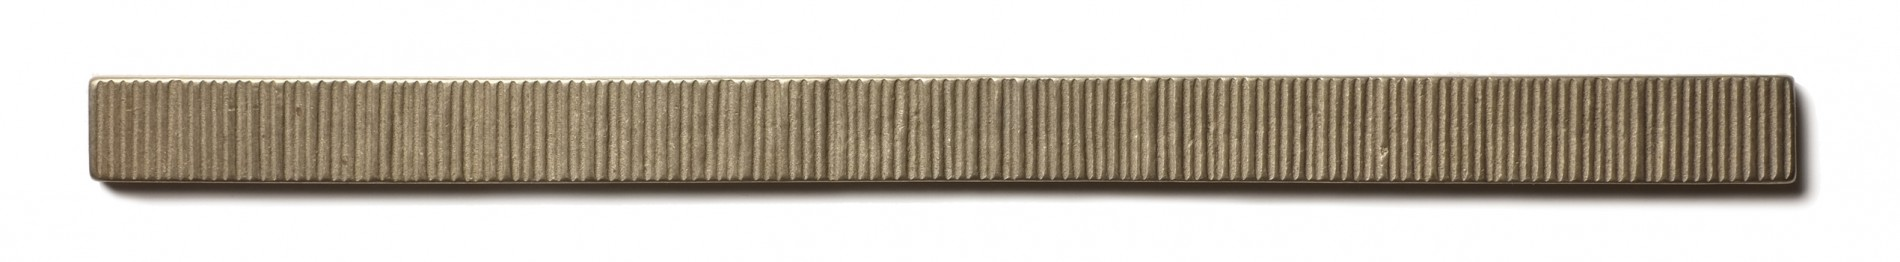 "Beach Grass Liner 0.75x12"" accent liner  White Bronze"